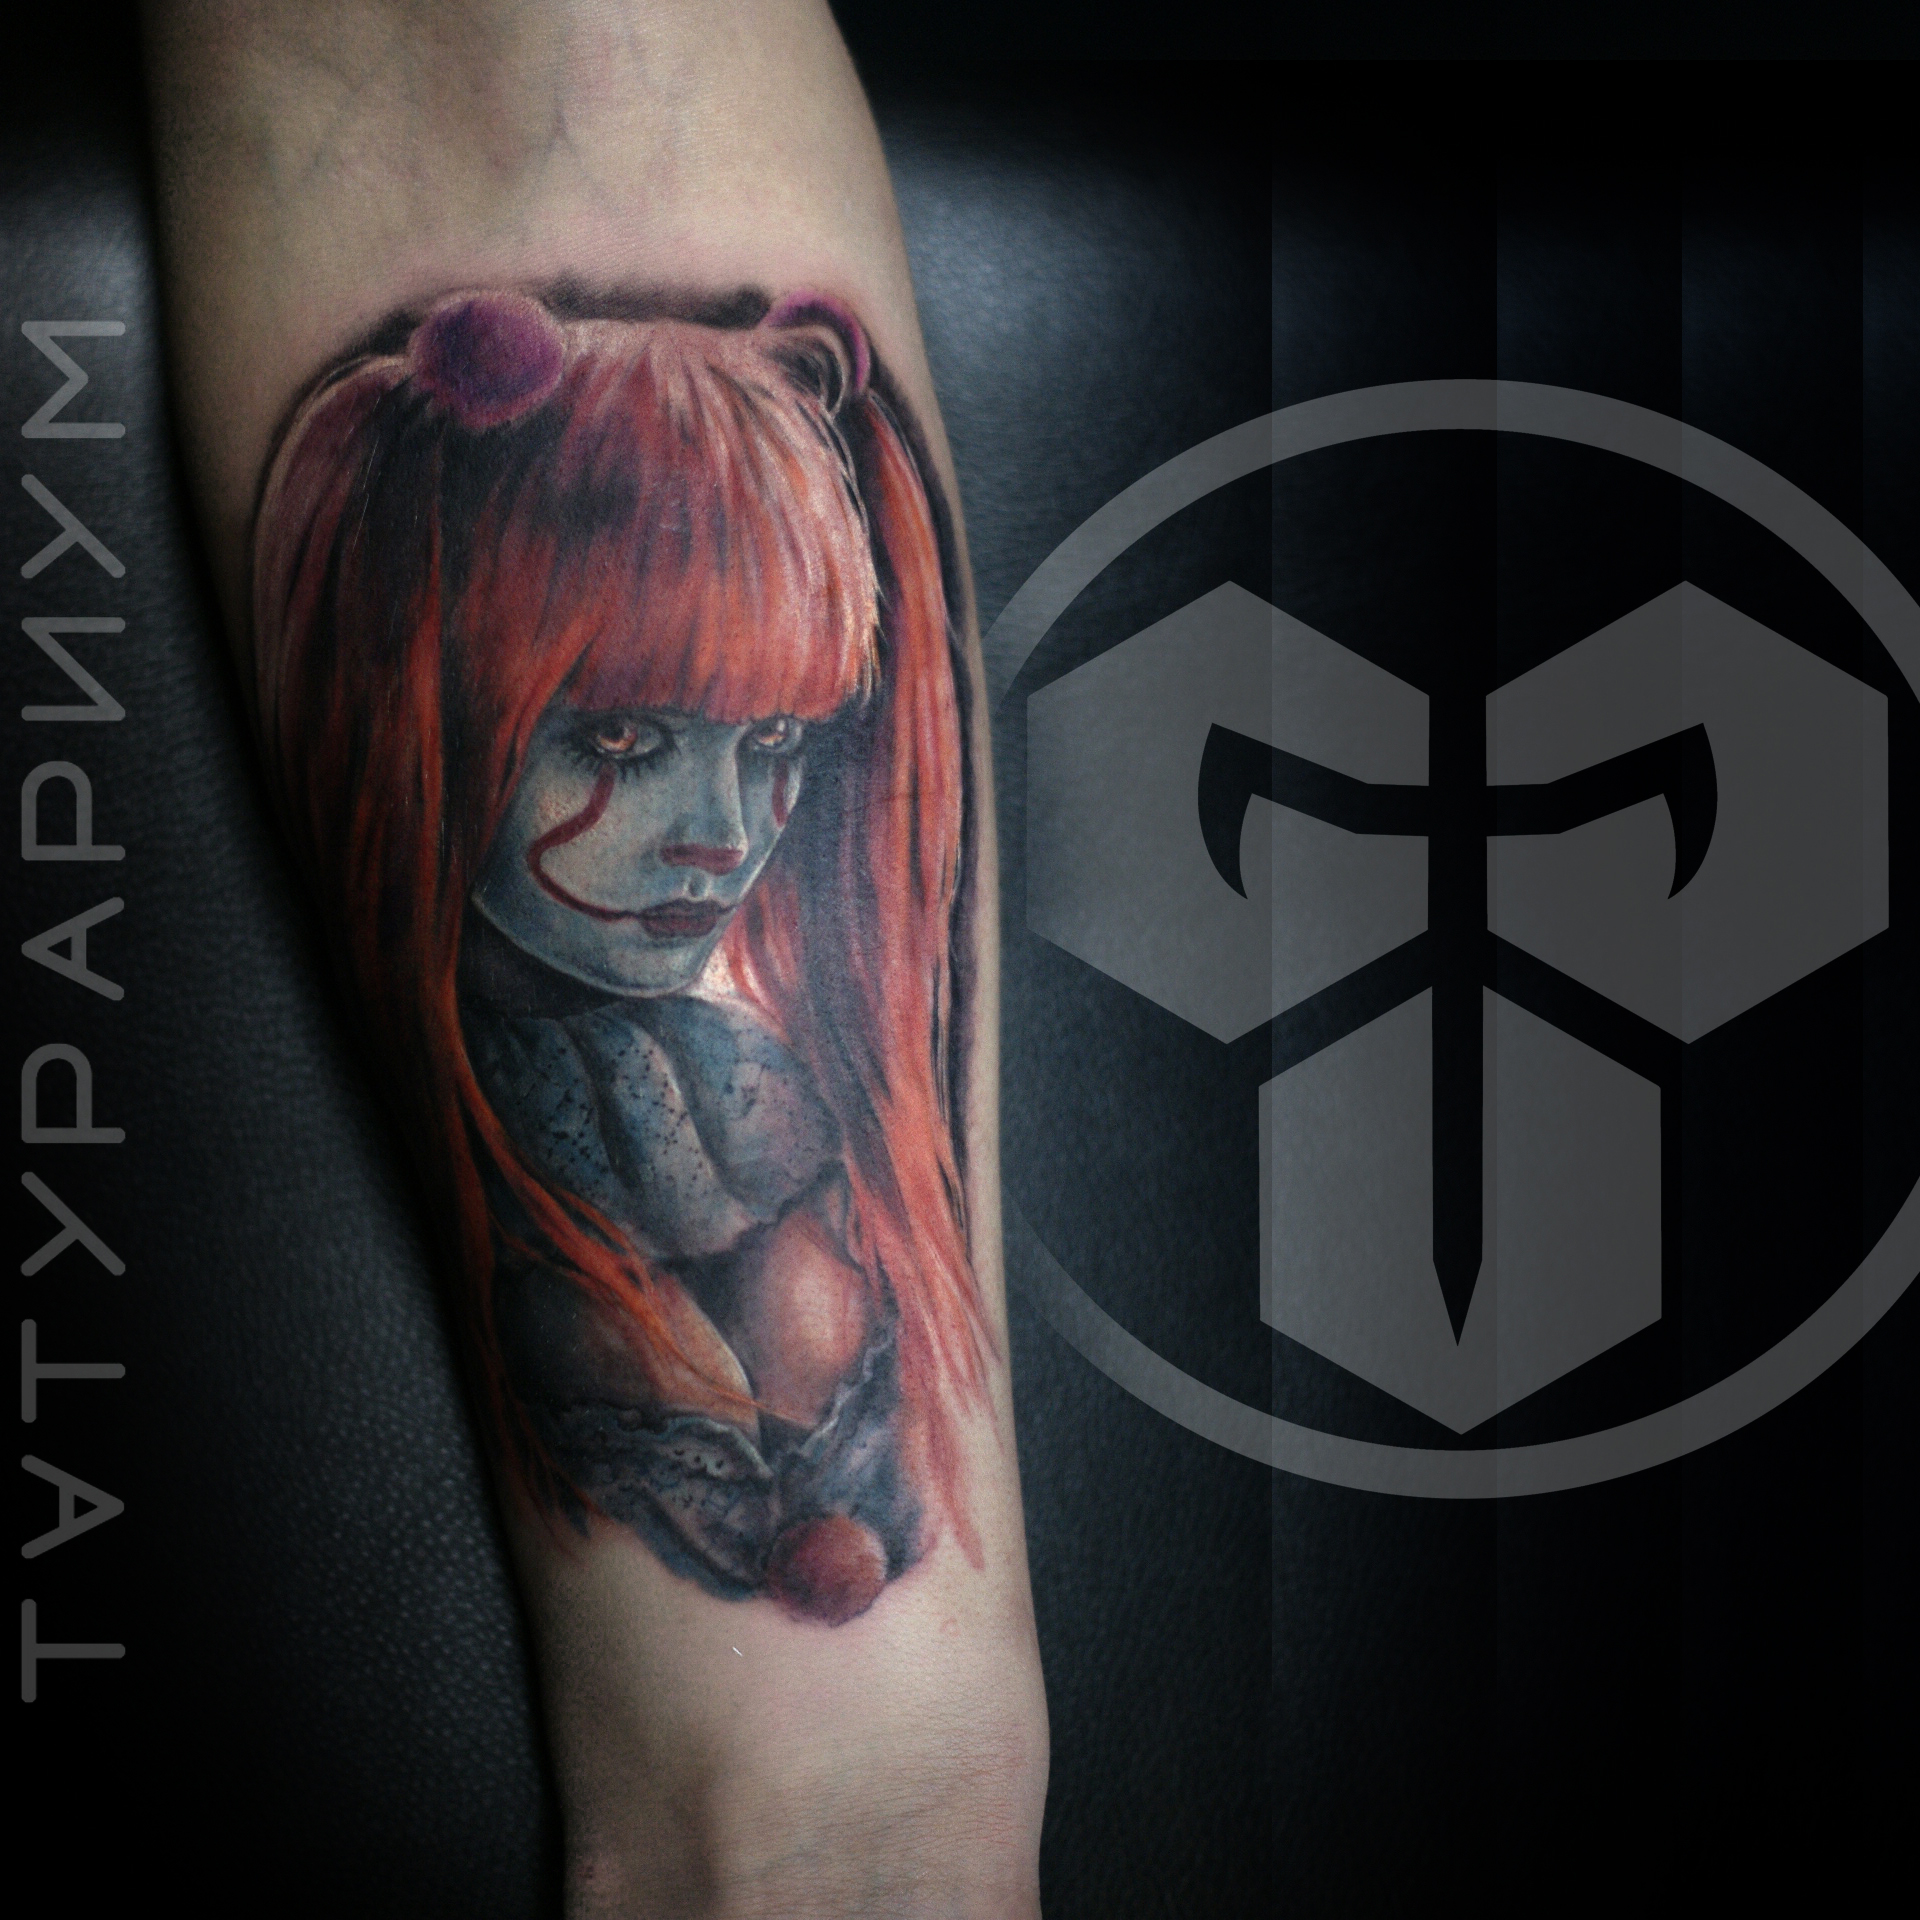 Фото татуировки, клоун пенивайз на руке